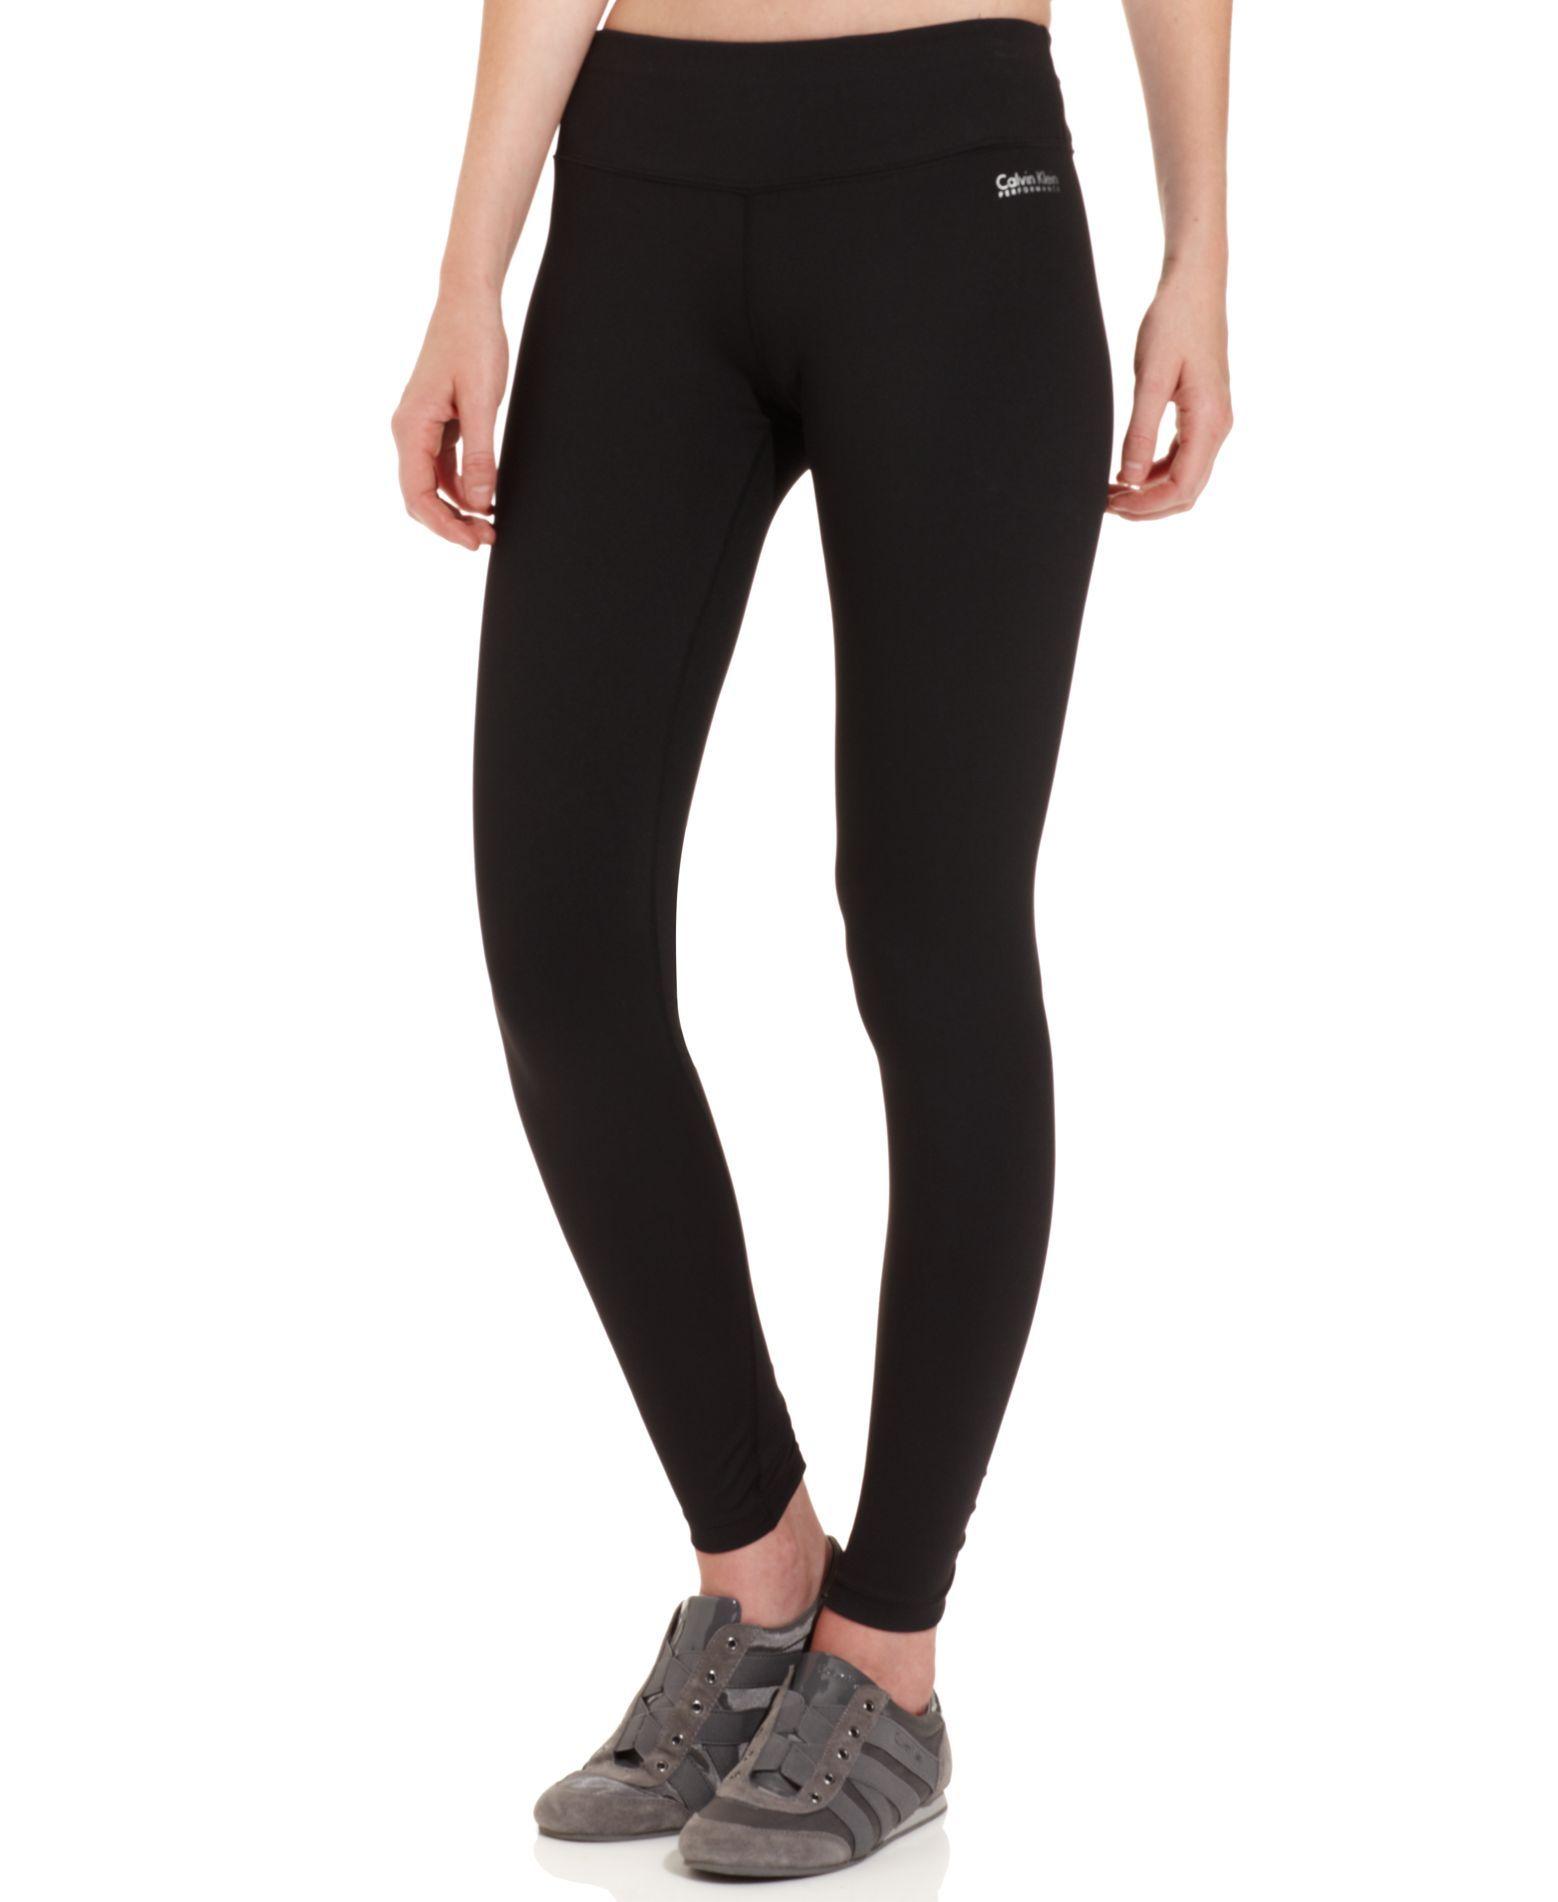 2fb01bbf5c02 Calvin Klein Performance Pants, Skinny Active Leggings - Activewear - Women  - Macy's